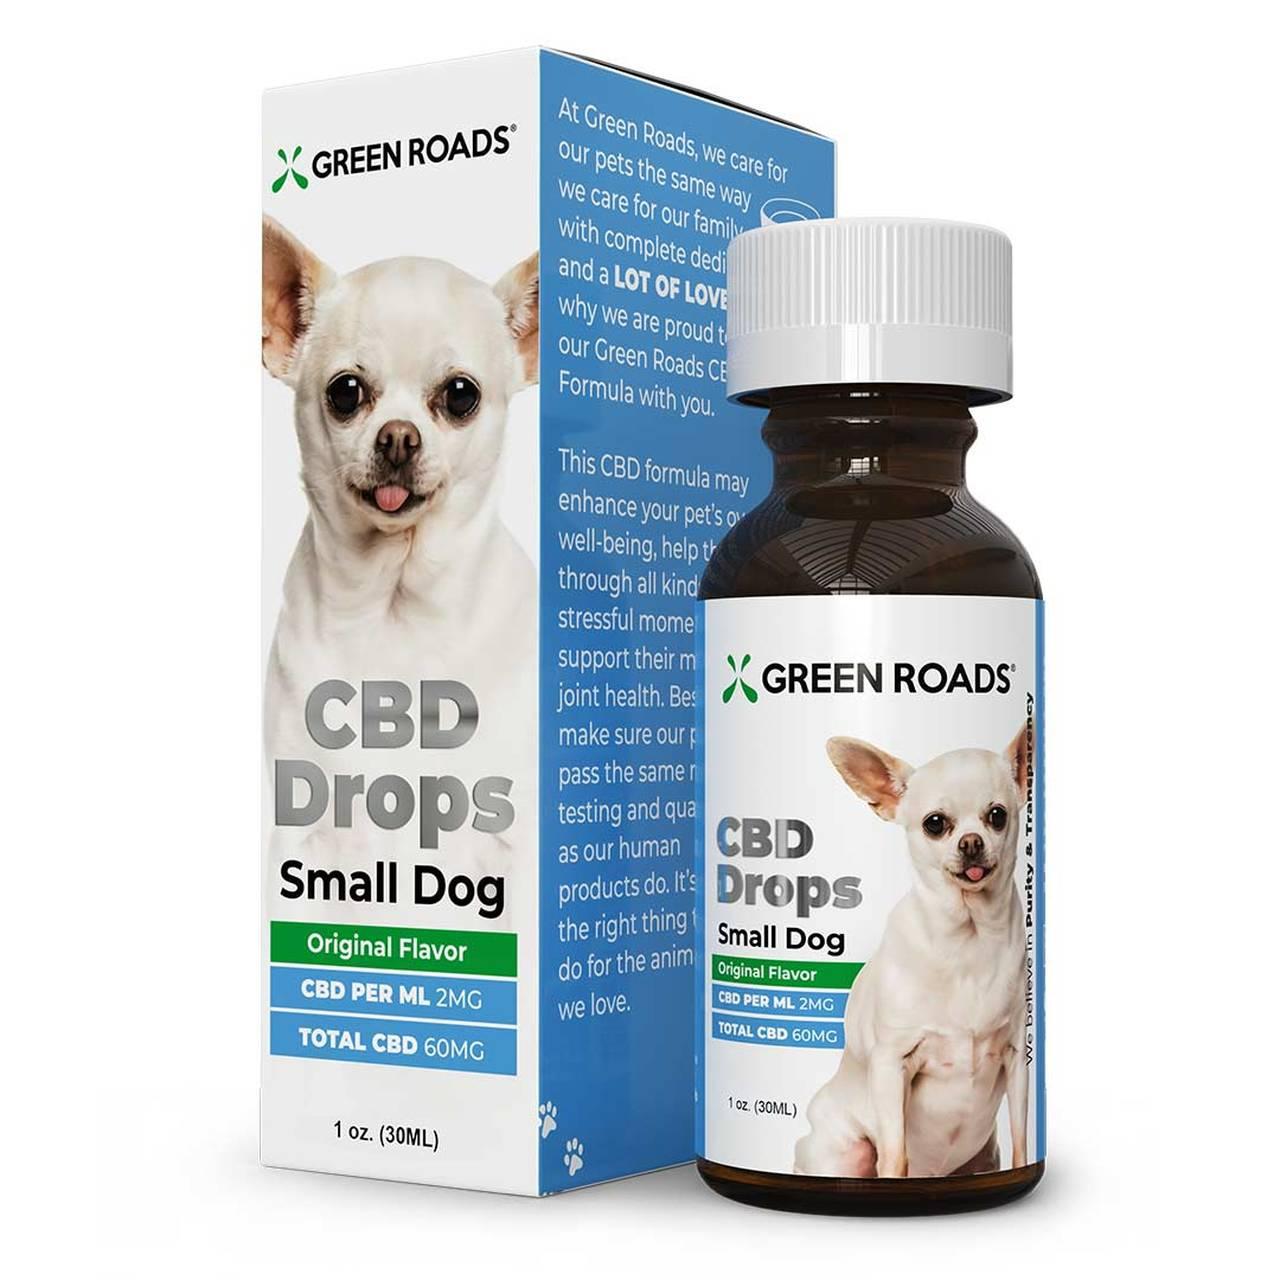 pharmacutical-grade-cbd-oil-2000-mg-TOP.jpg